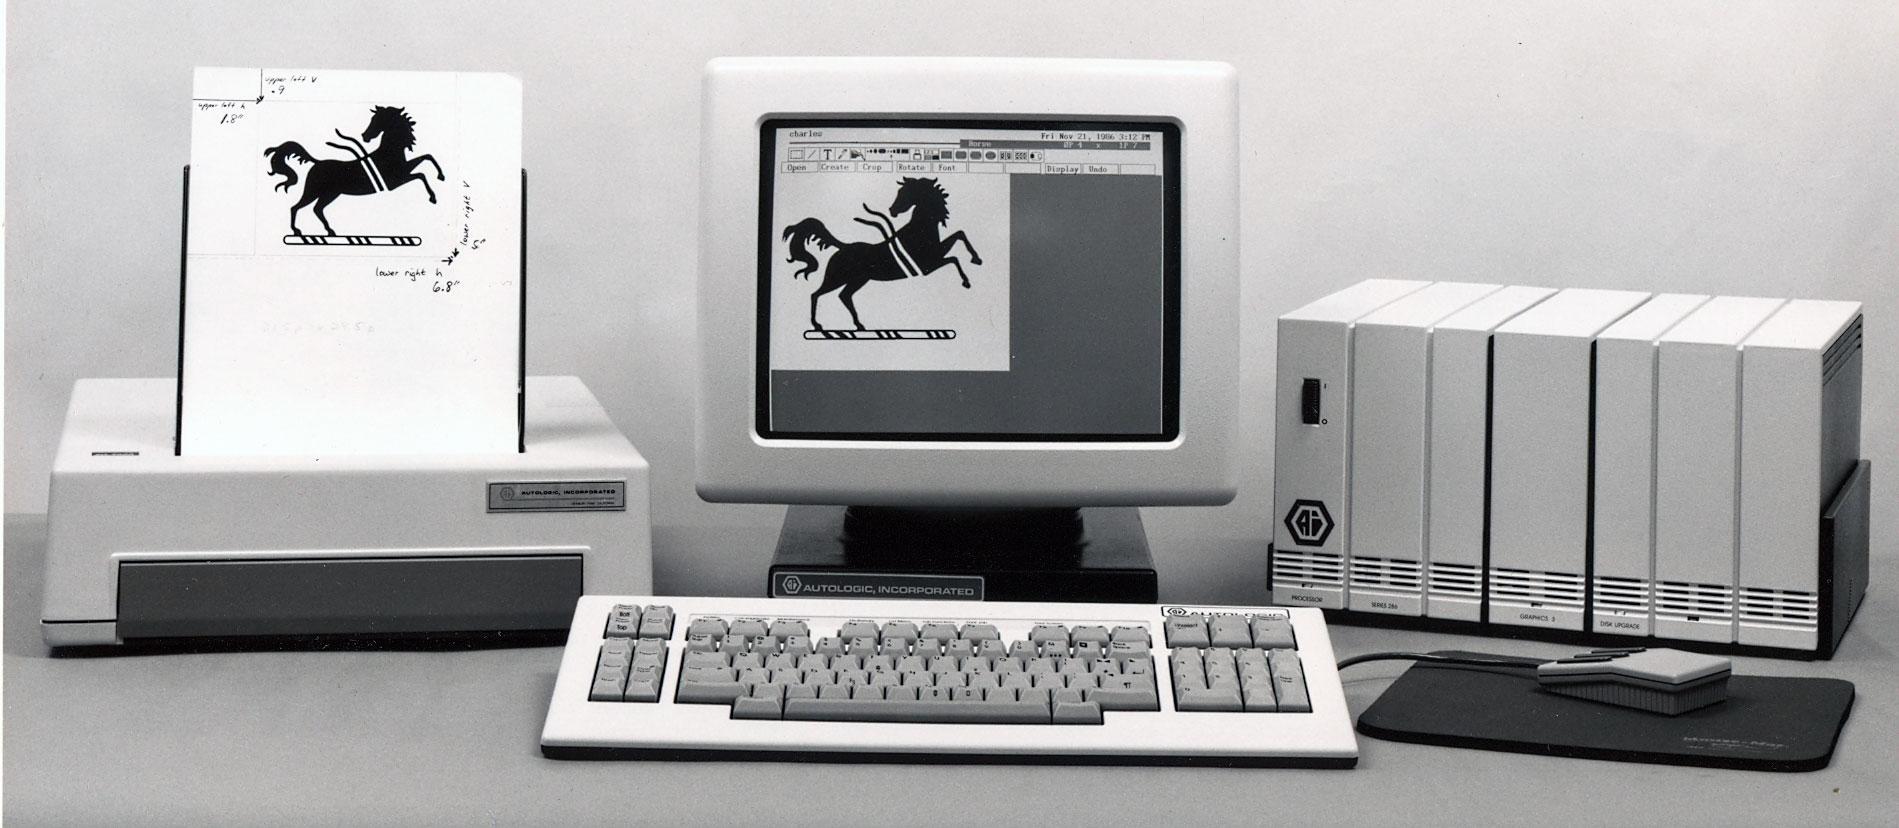 Raster Editor on the Microcomposer Workstation